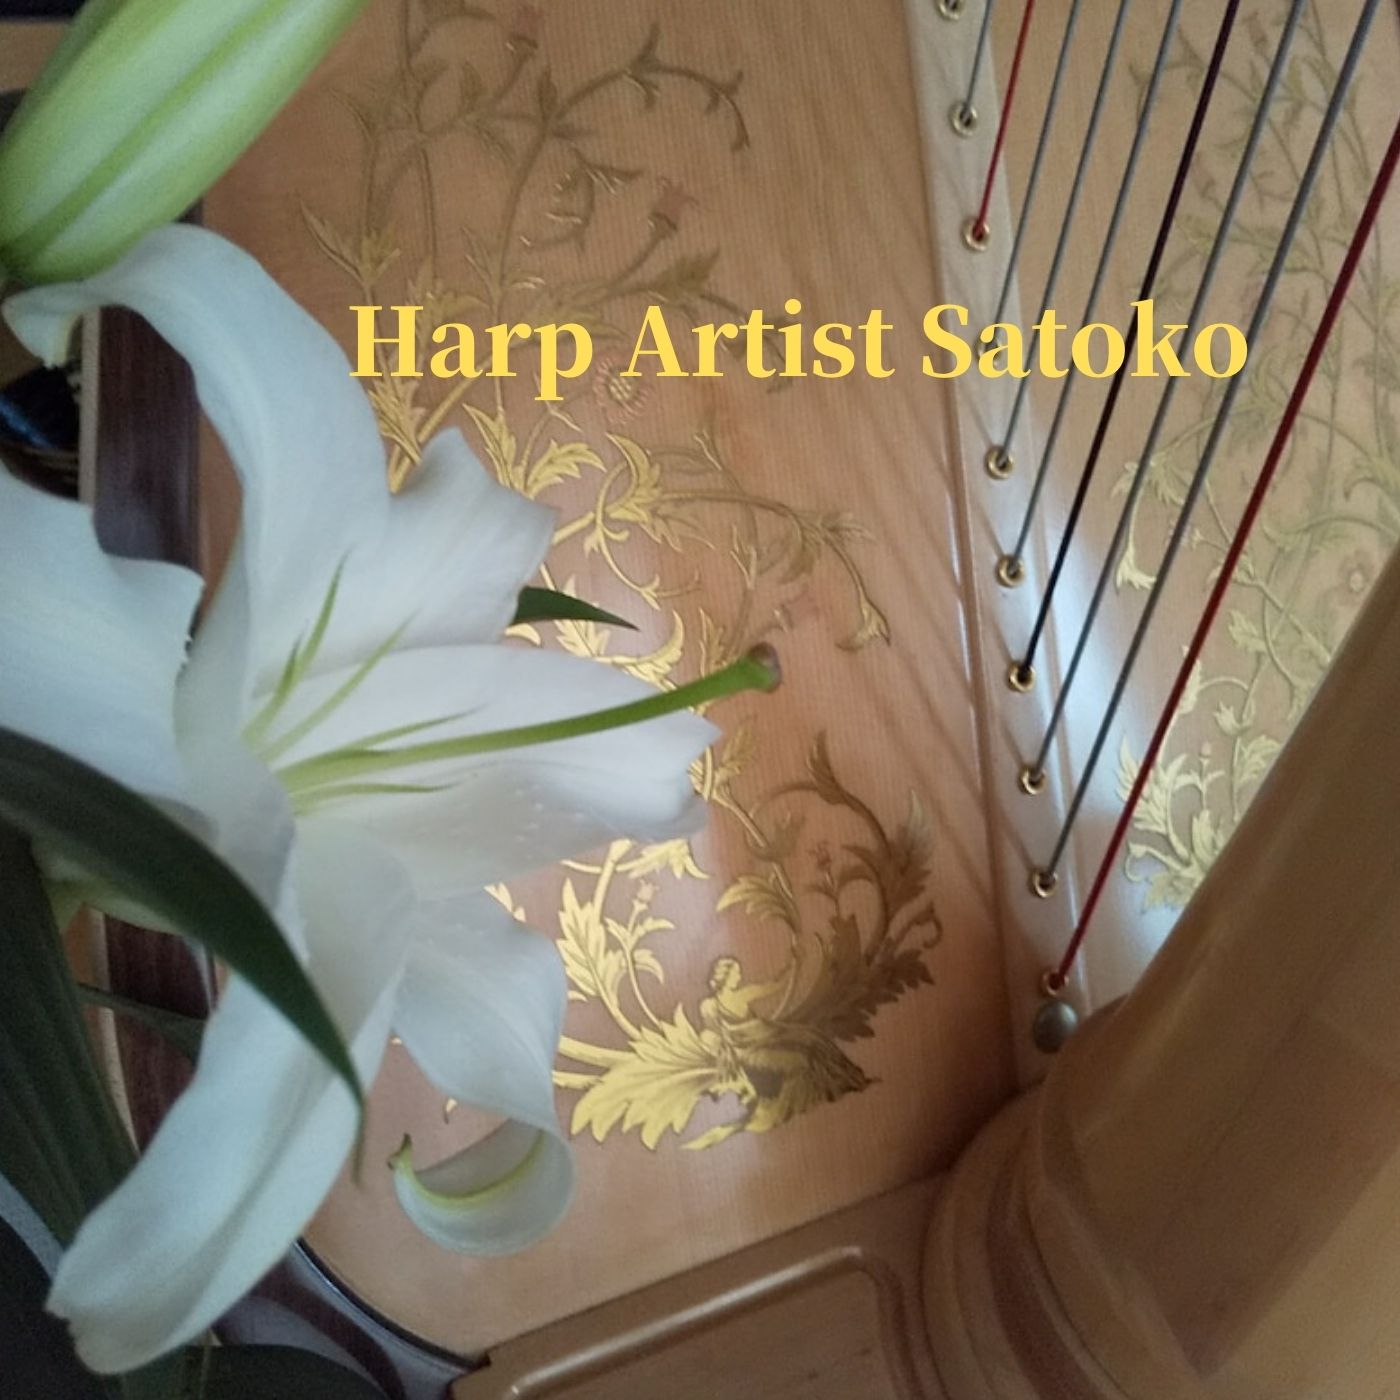 Harp Artist Satoko CDの原本